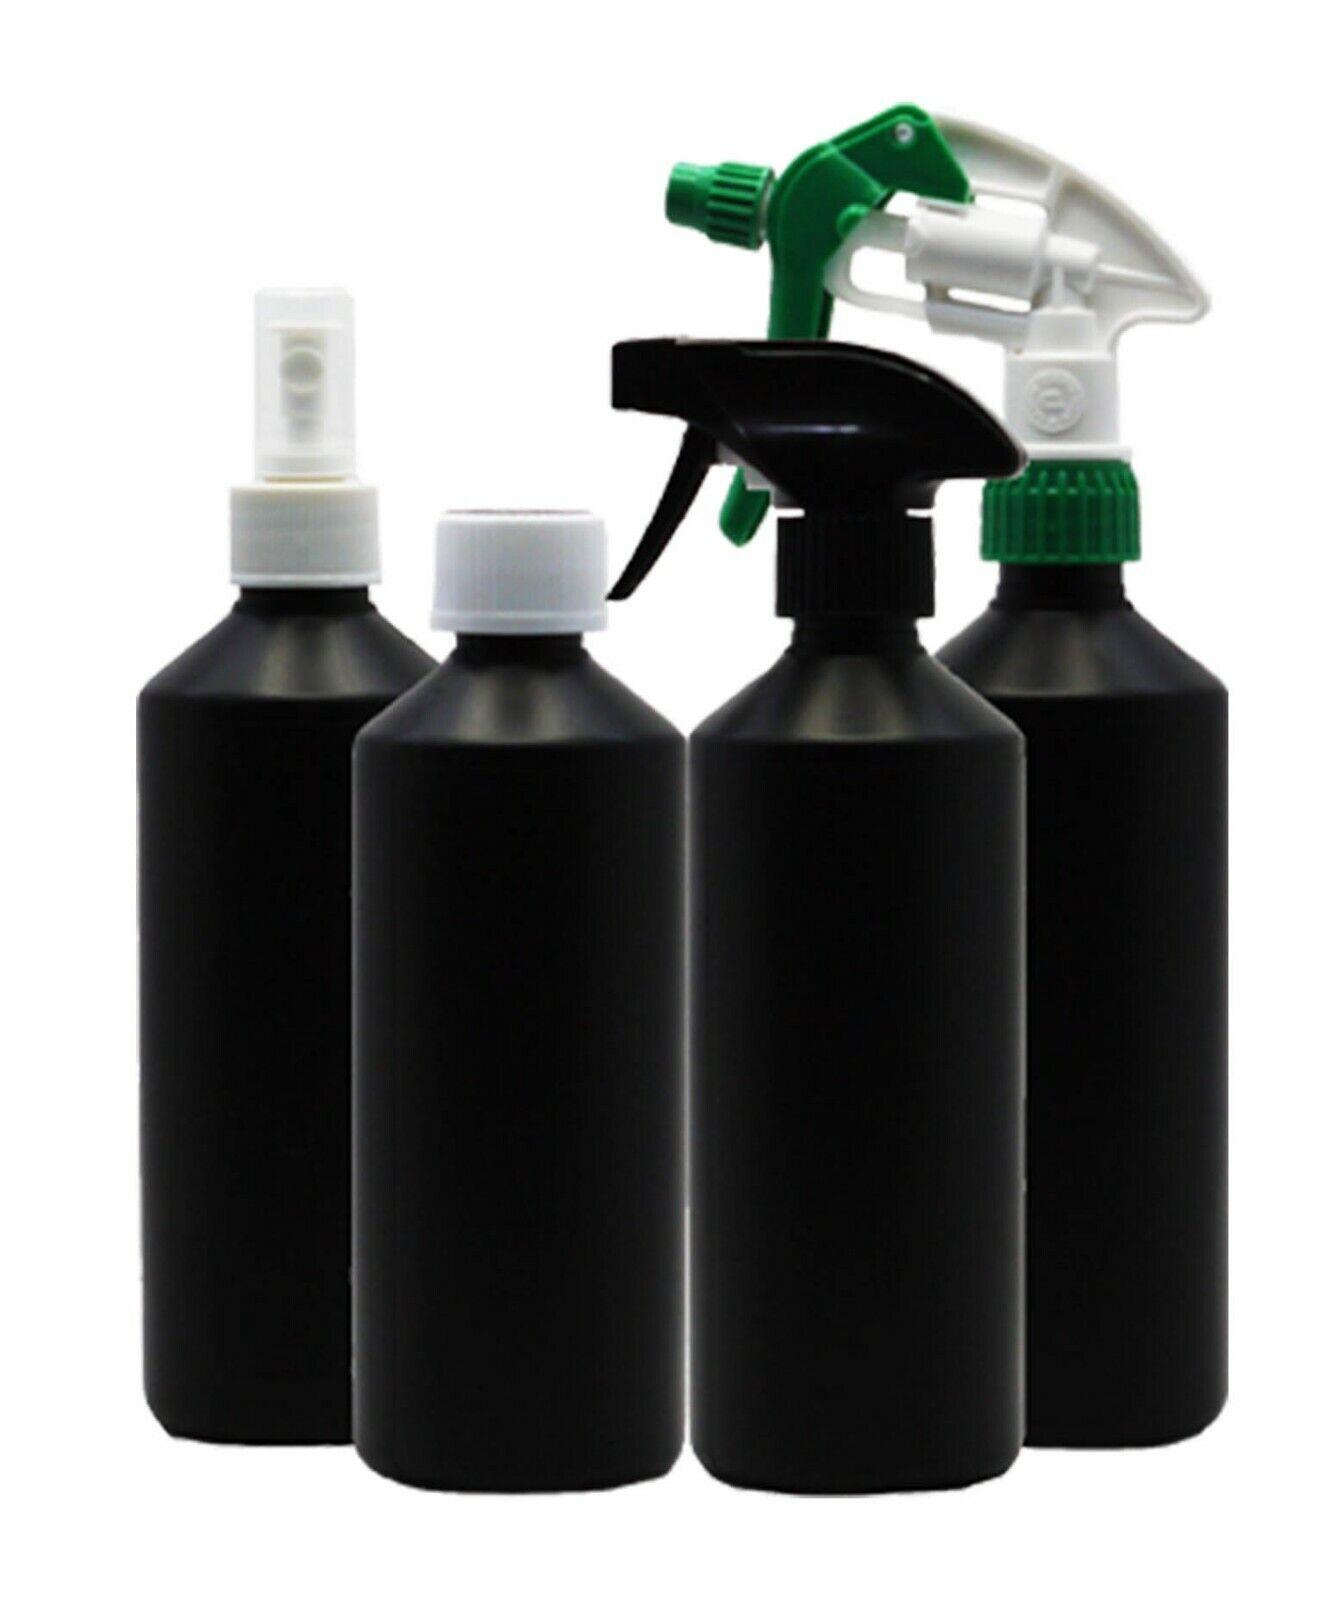 HDPE 500ml Bottles - Black - Empty Bottles With Optional Spray Heads - 5 Pack